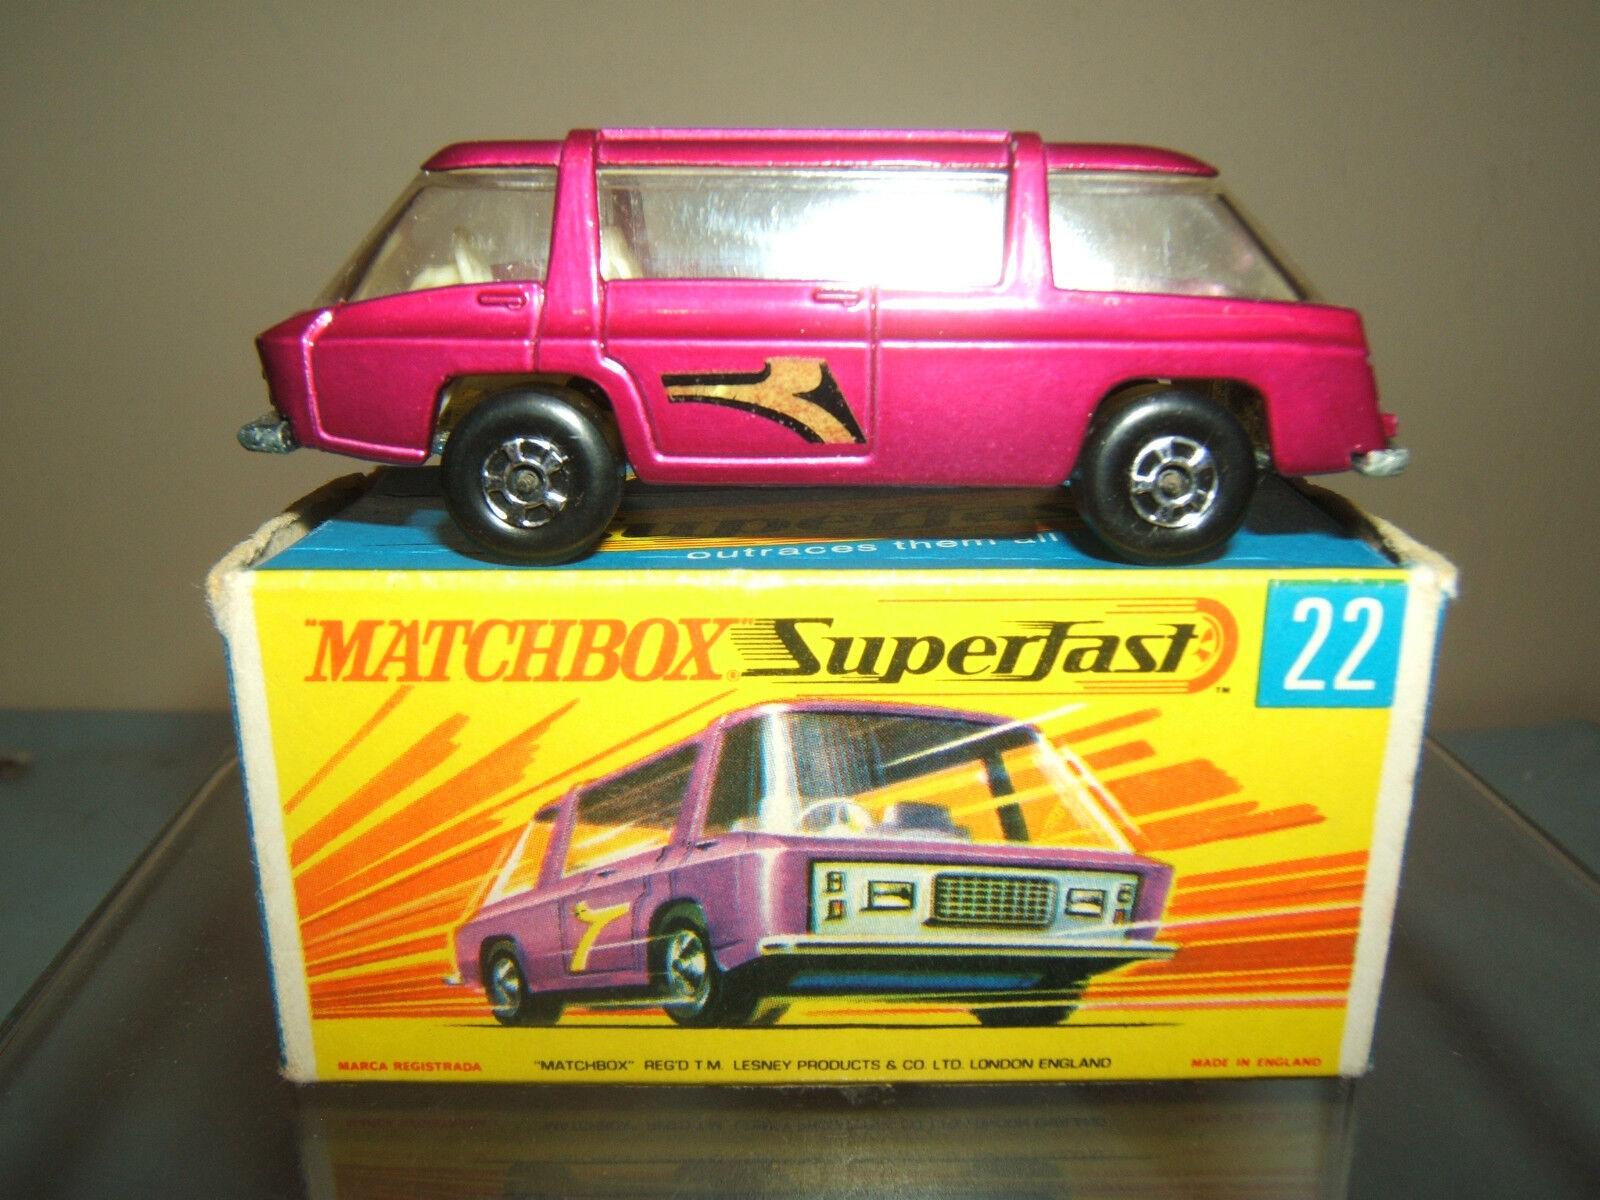 MATCHBOX SUPERFAST  MODEL No.22d FREEMAN INTERCITY     VN  MIB